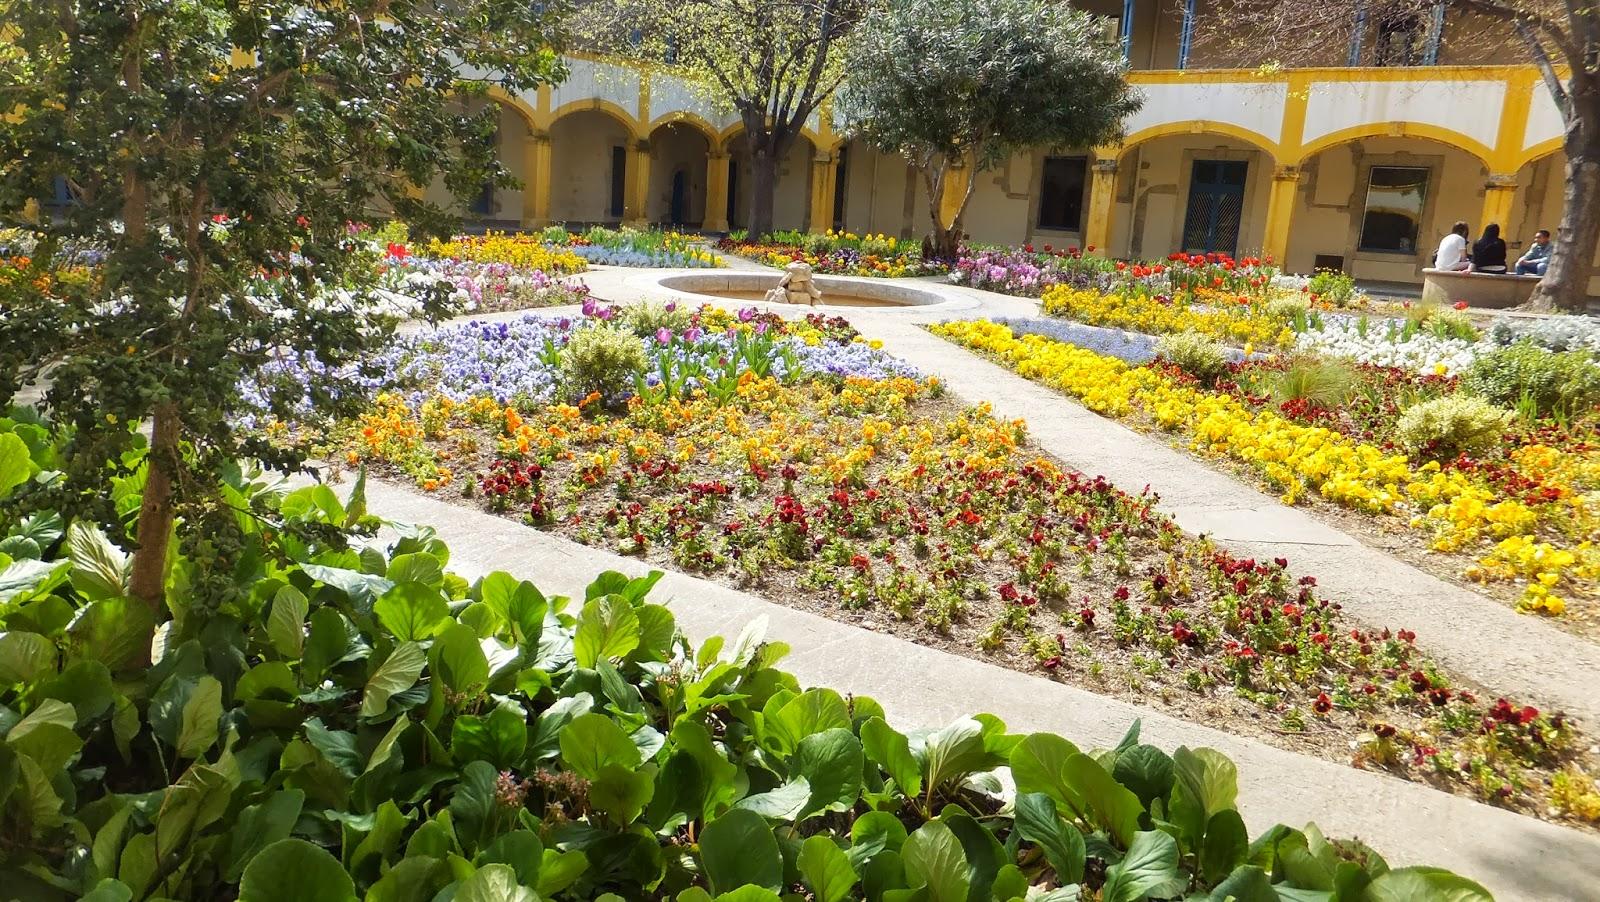 Espace Van Gogh, Arles, Provence, Fancia, Elisa N, Blog de Viajes, Lifestyle, Travel